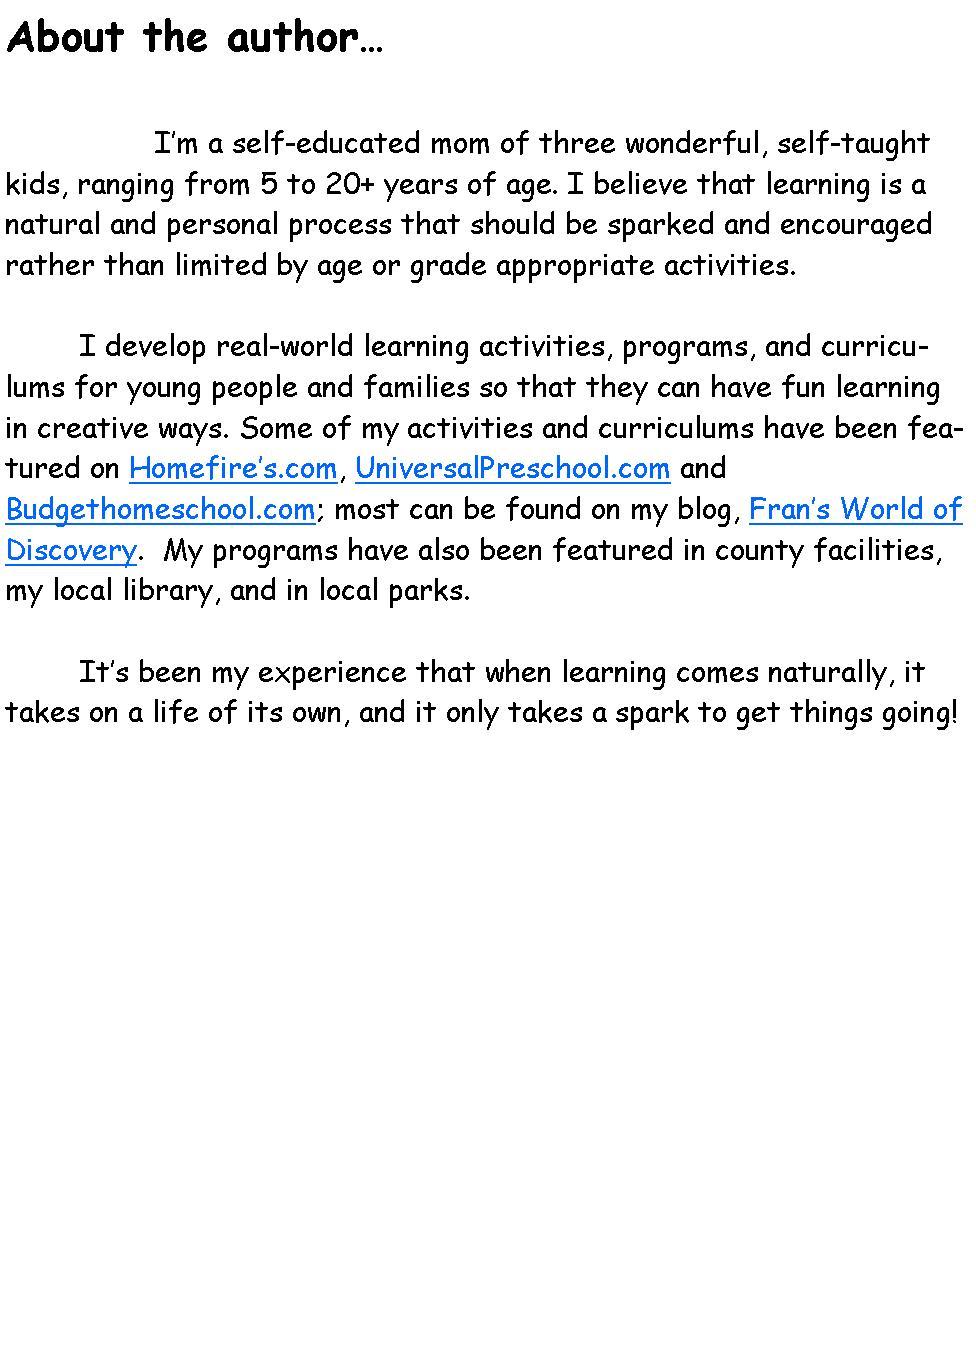 funschooling  u0026 recreational learning  strawberry craze ebook